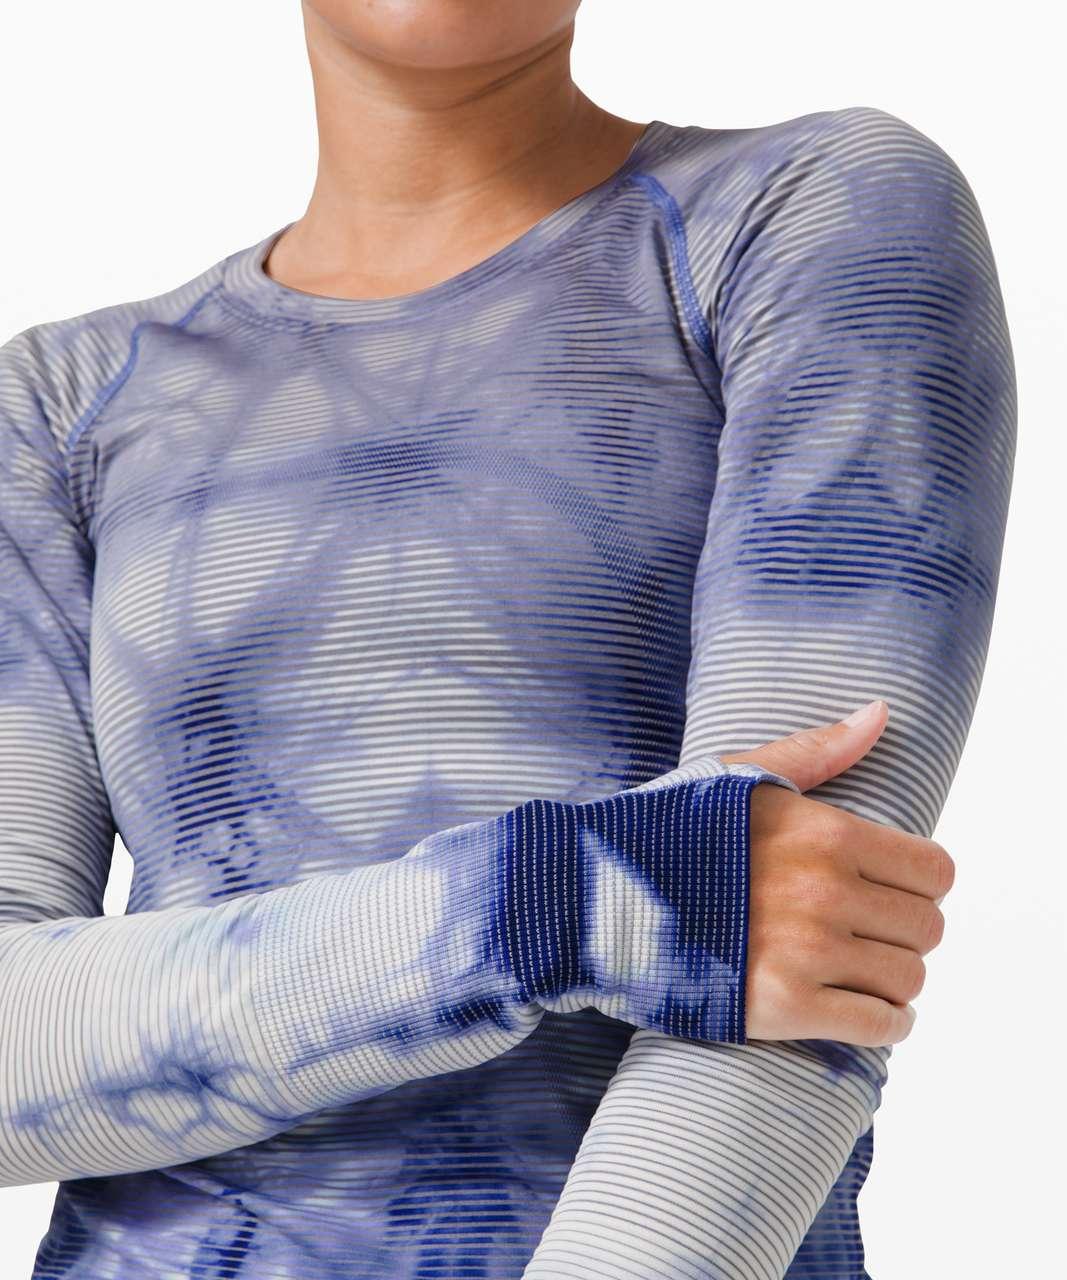 Lululemon Swiftly Tech Long Sleeve 2.0 *Wash - Shibori Stripe Midnight Orchid